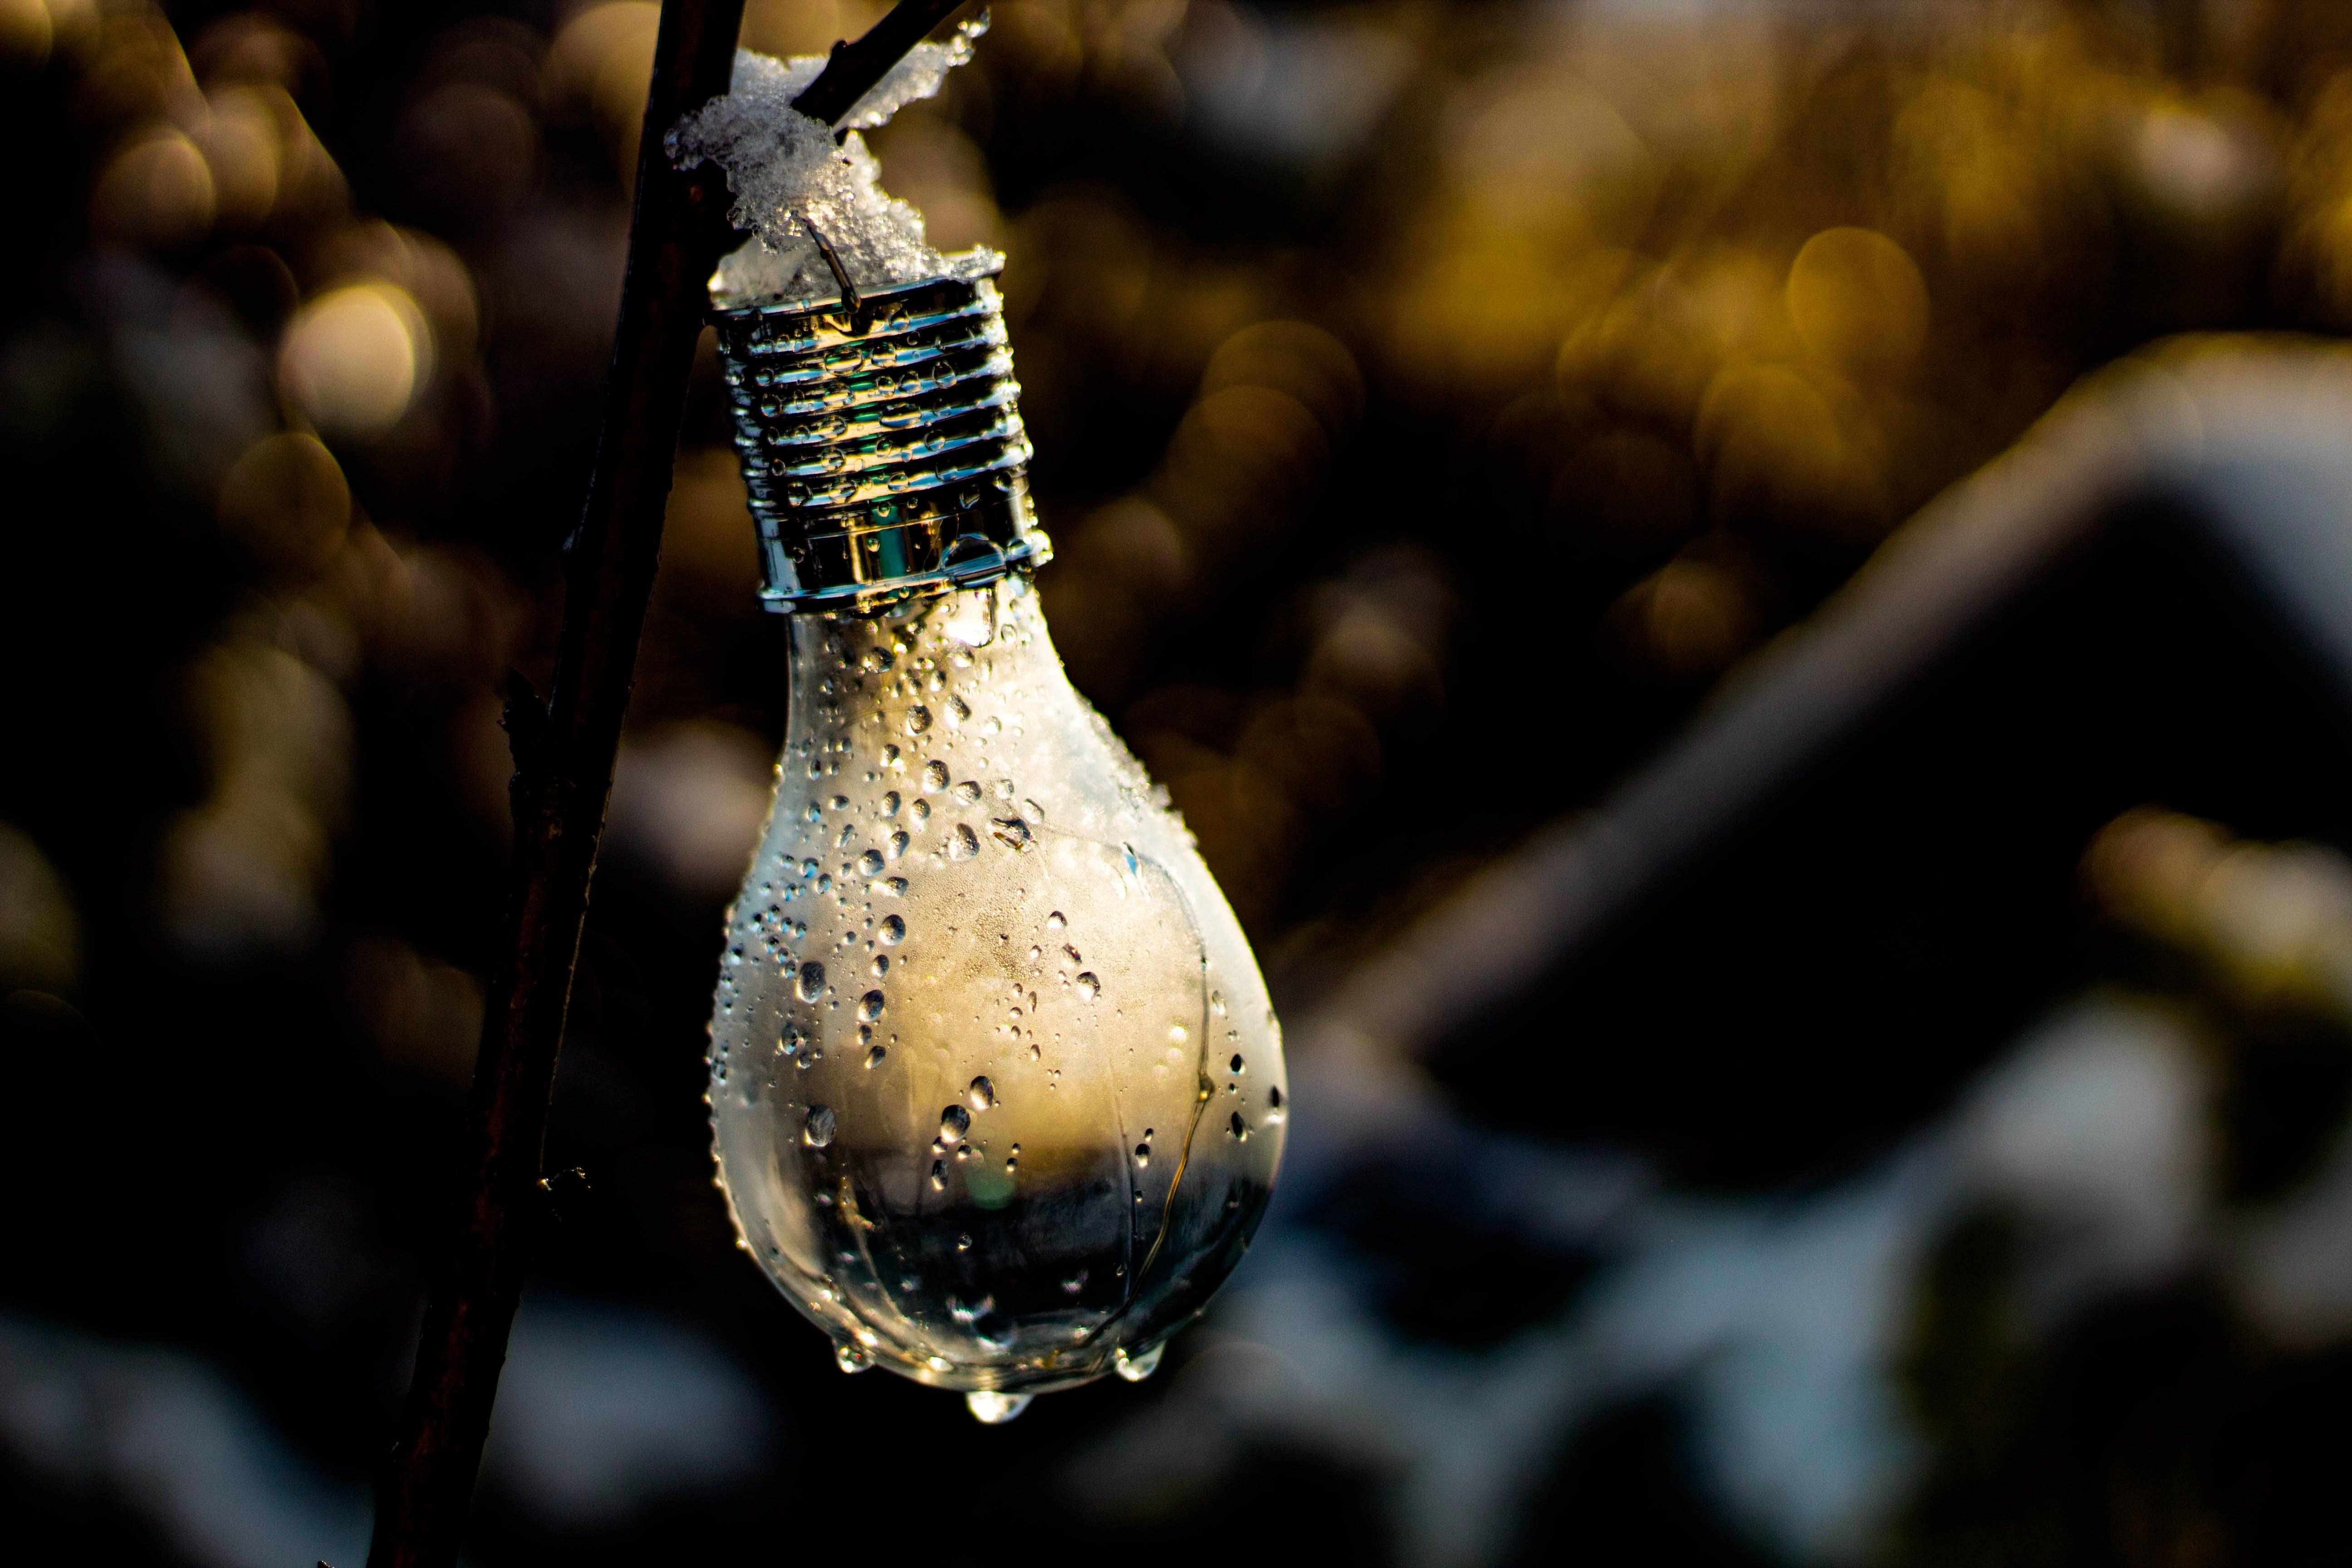 Shallow Focus Photography of Light Bulb